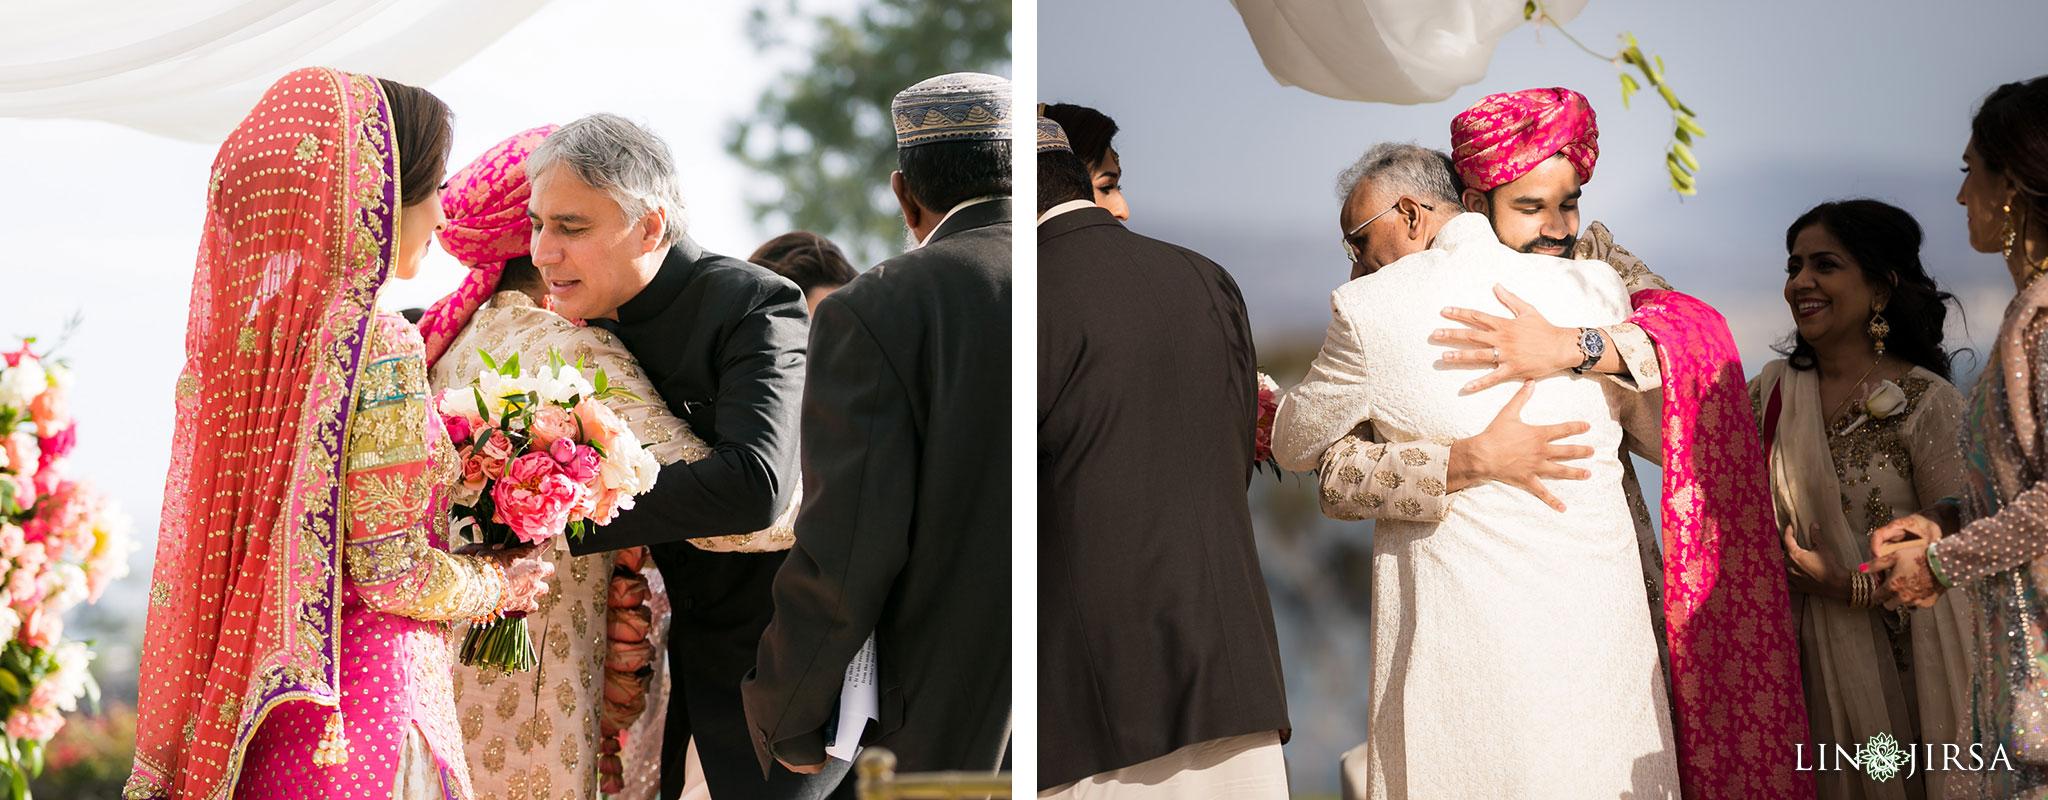 32 laguna cliffs marriott muslim wedding ceremony nikah photography